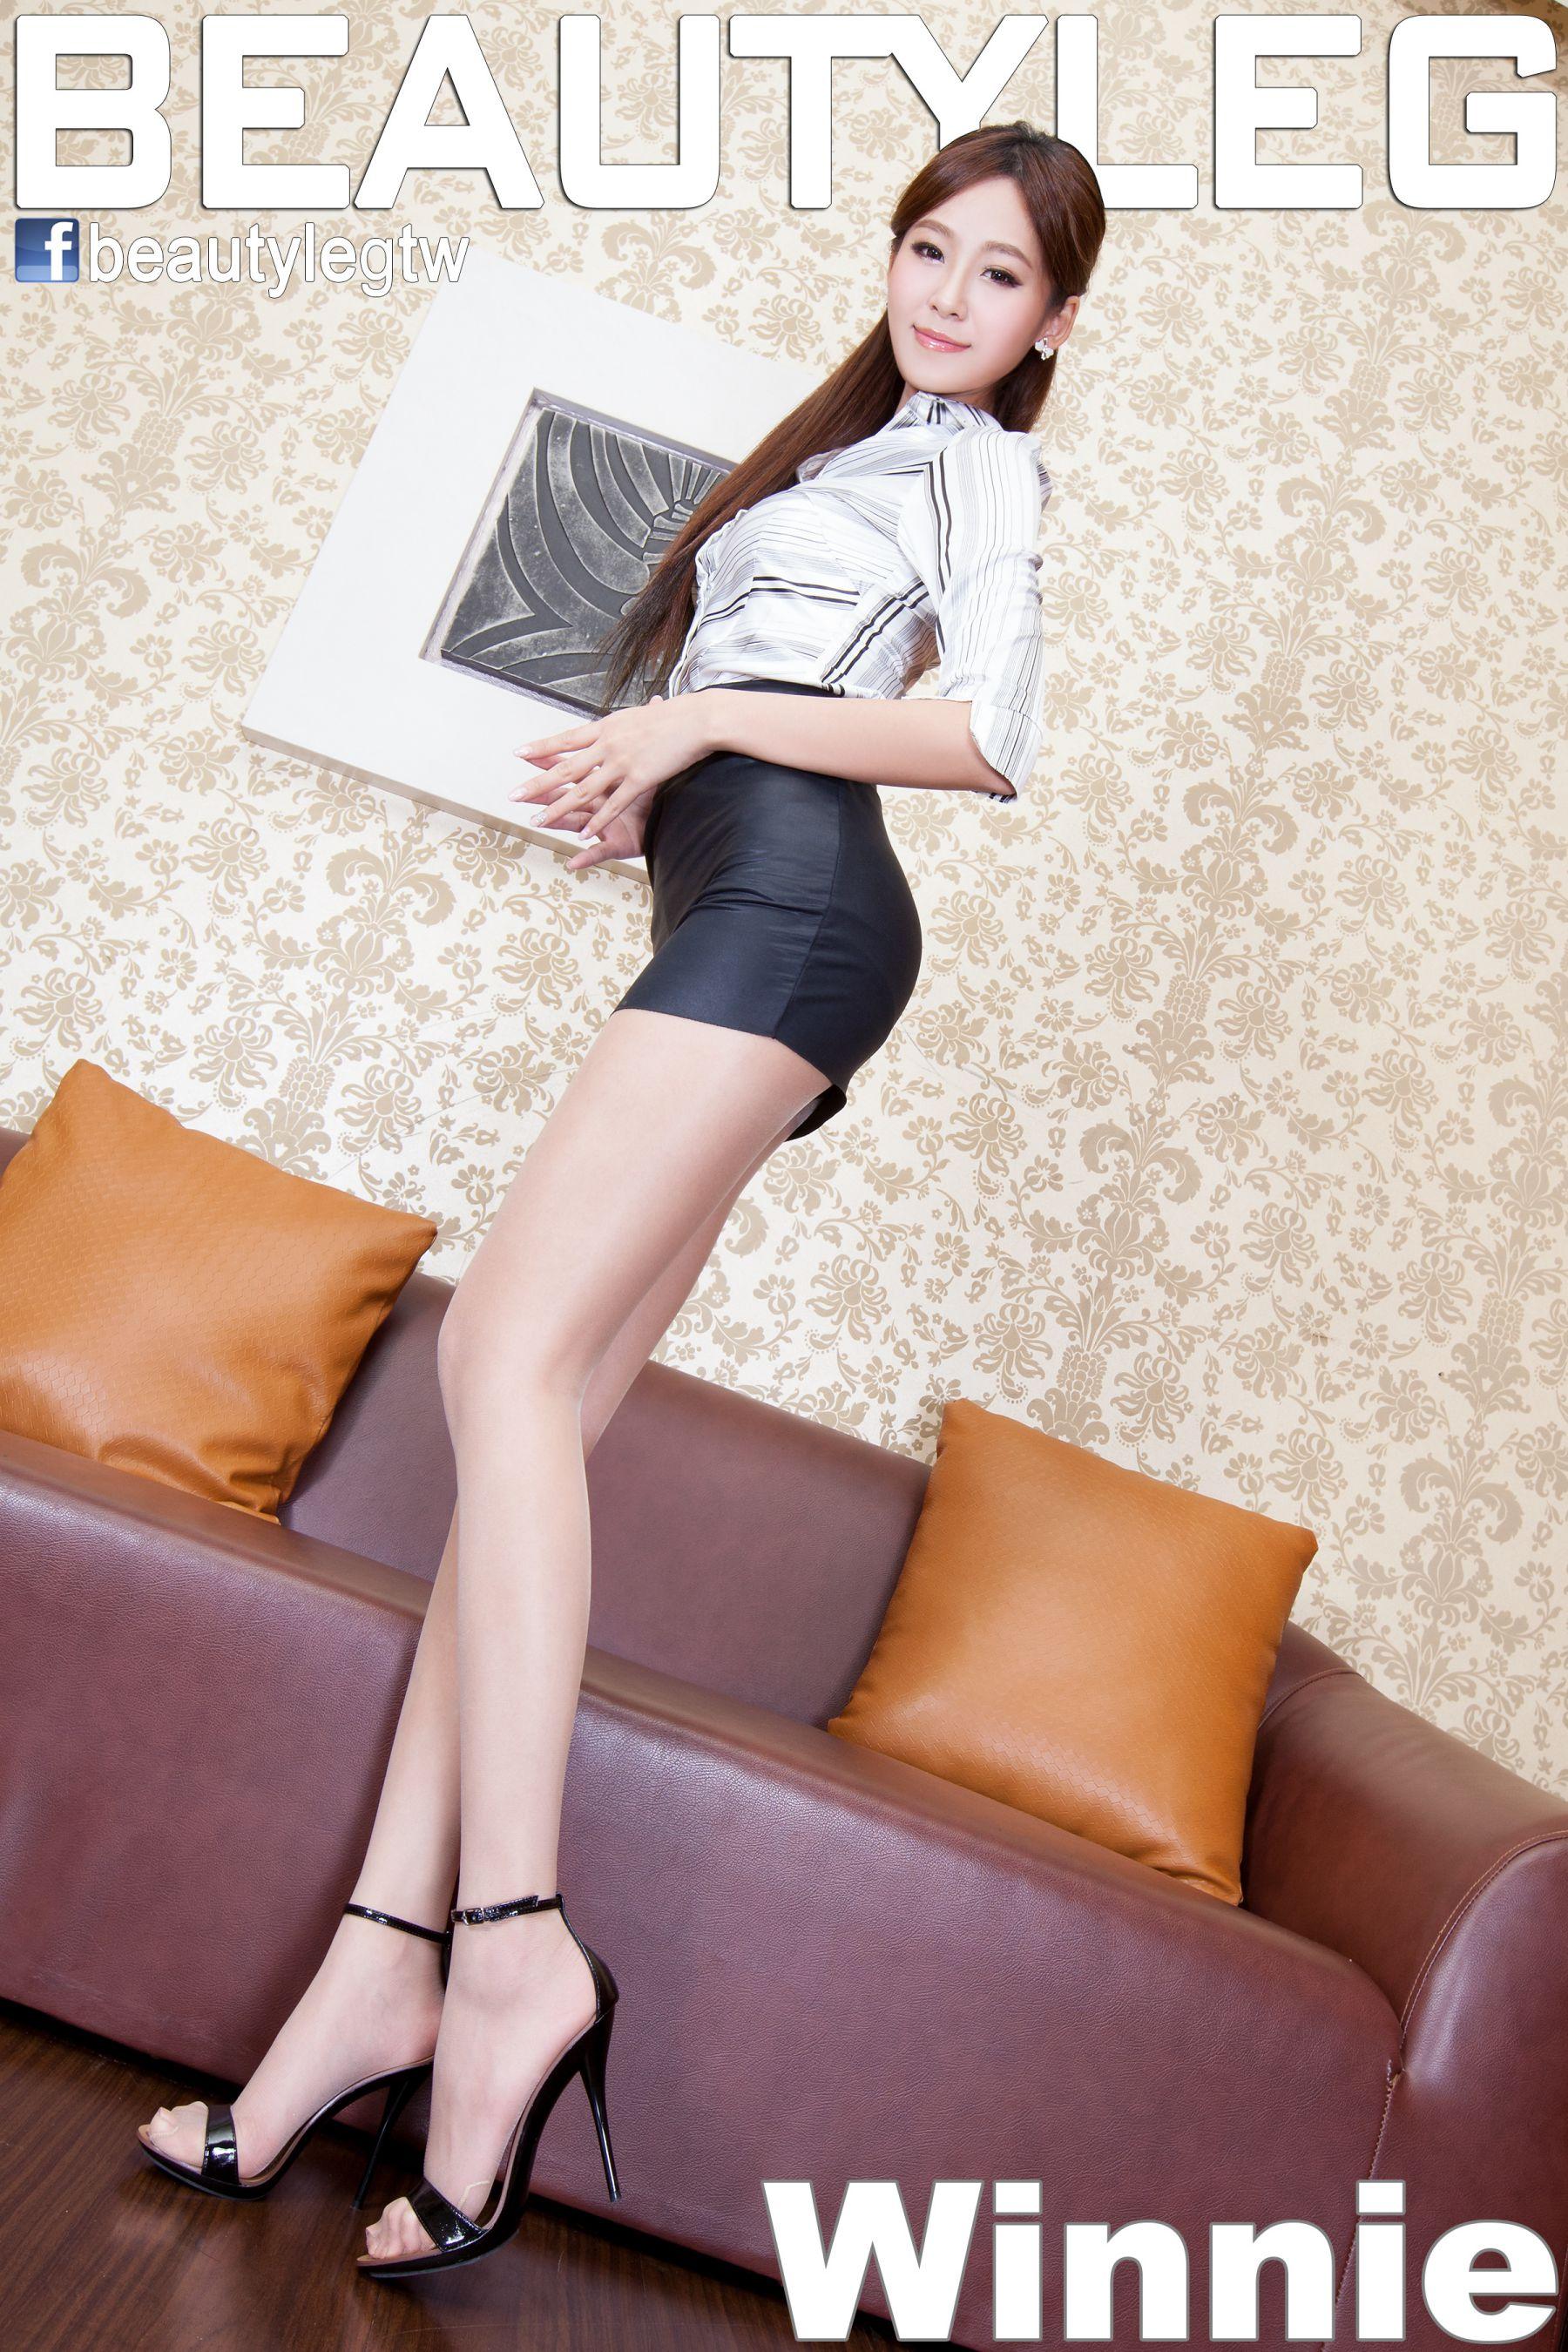 VOL.1128 [Beautyleg]长腿美女:Winnie小雪(庄咏惠,庄温妮,腿模Winnie)高品质写真套图(51P)